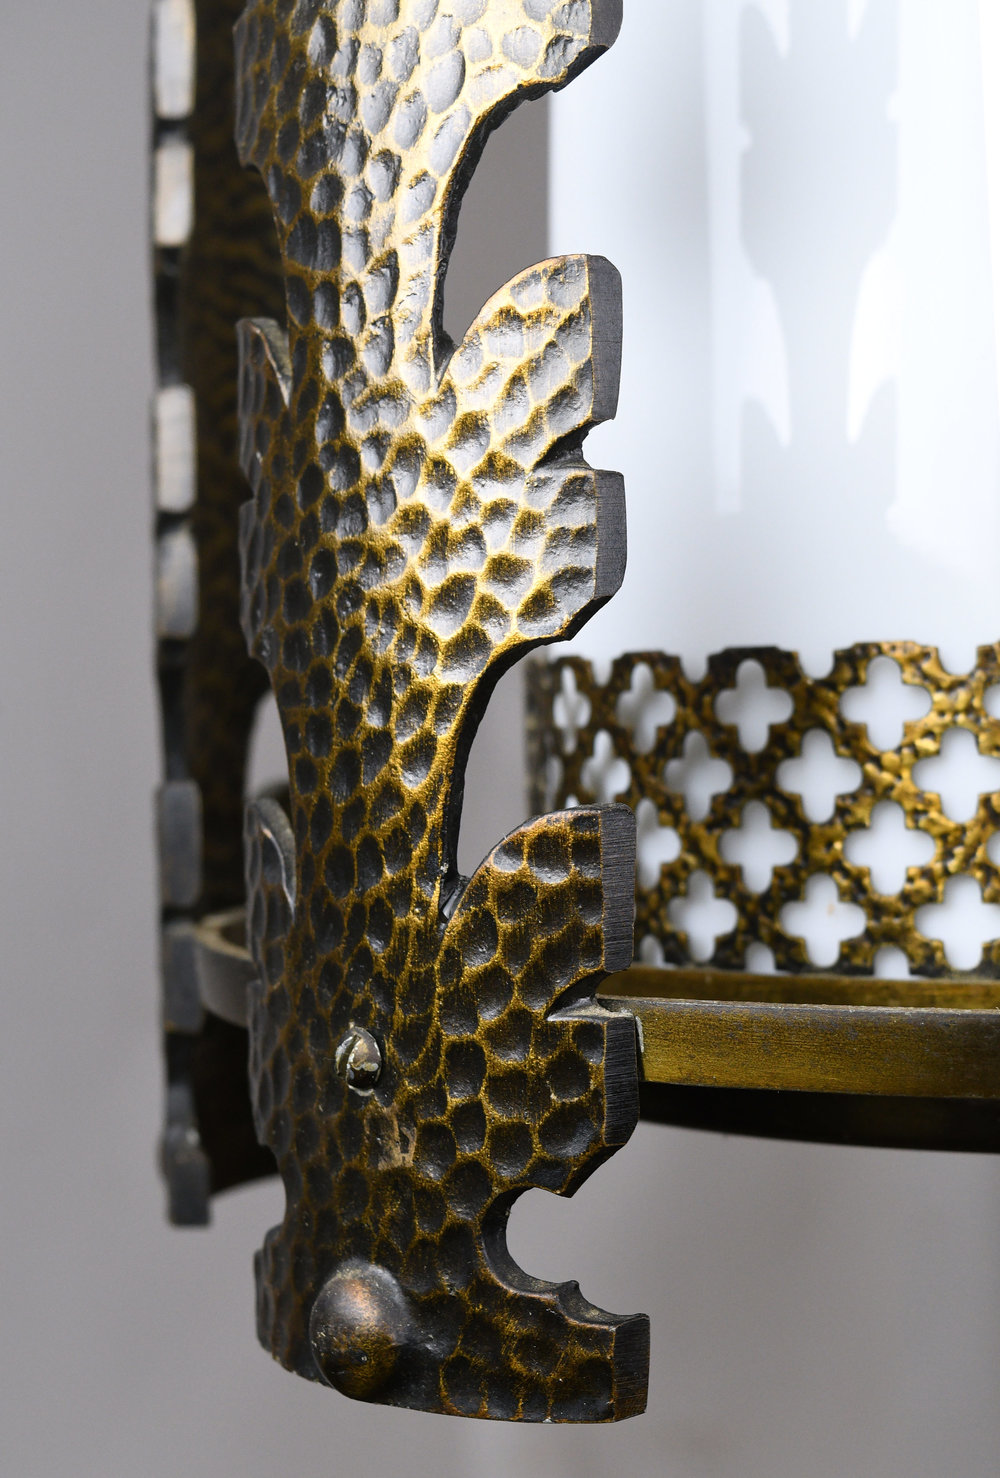 47634-midcentury-tube-pendant-closeup.jpg